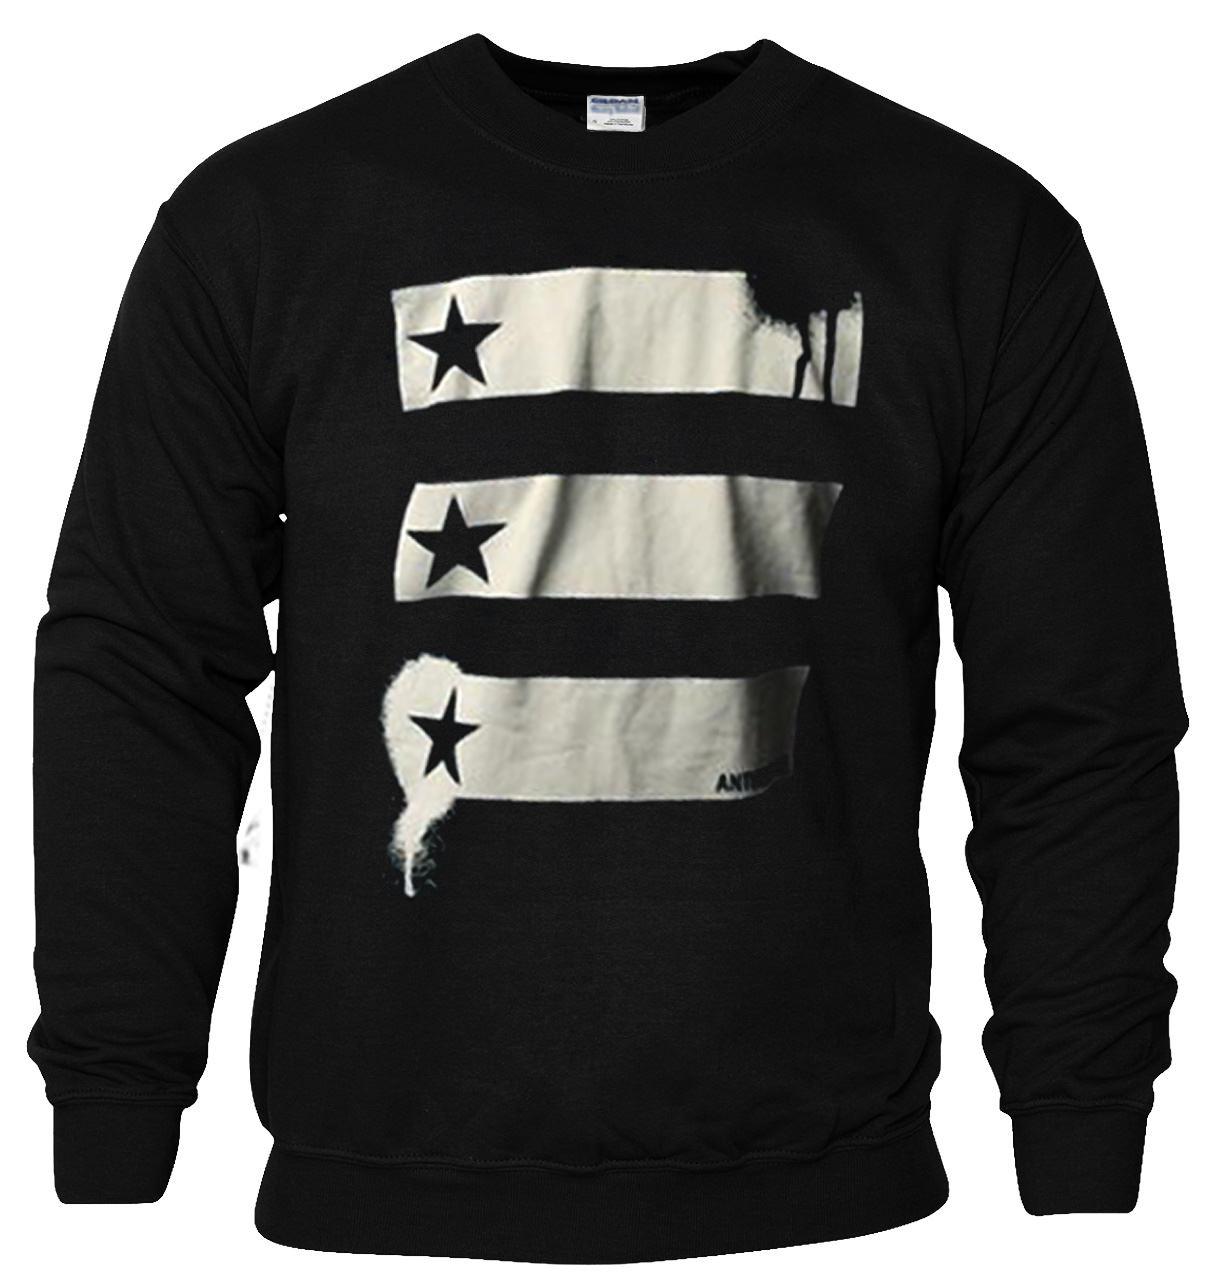 Barn and Stars Anthem made Sweatshirt